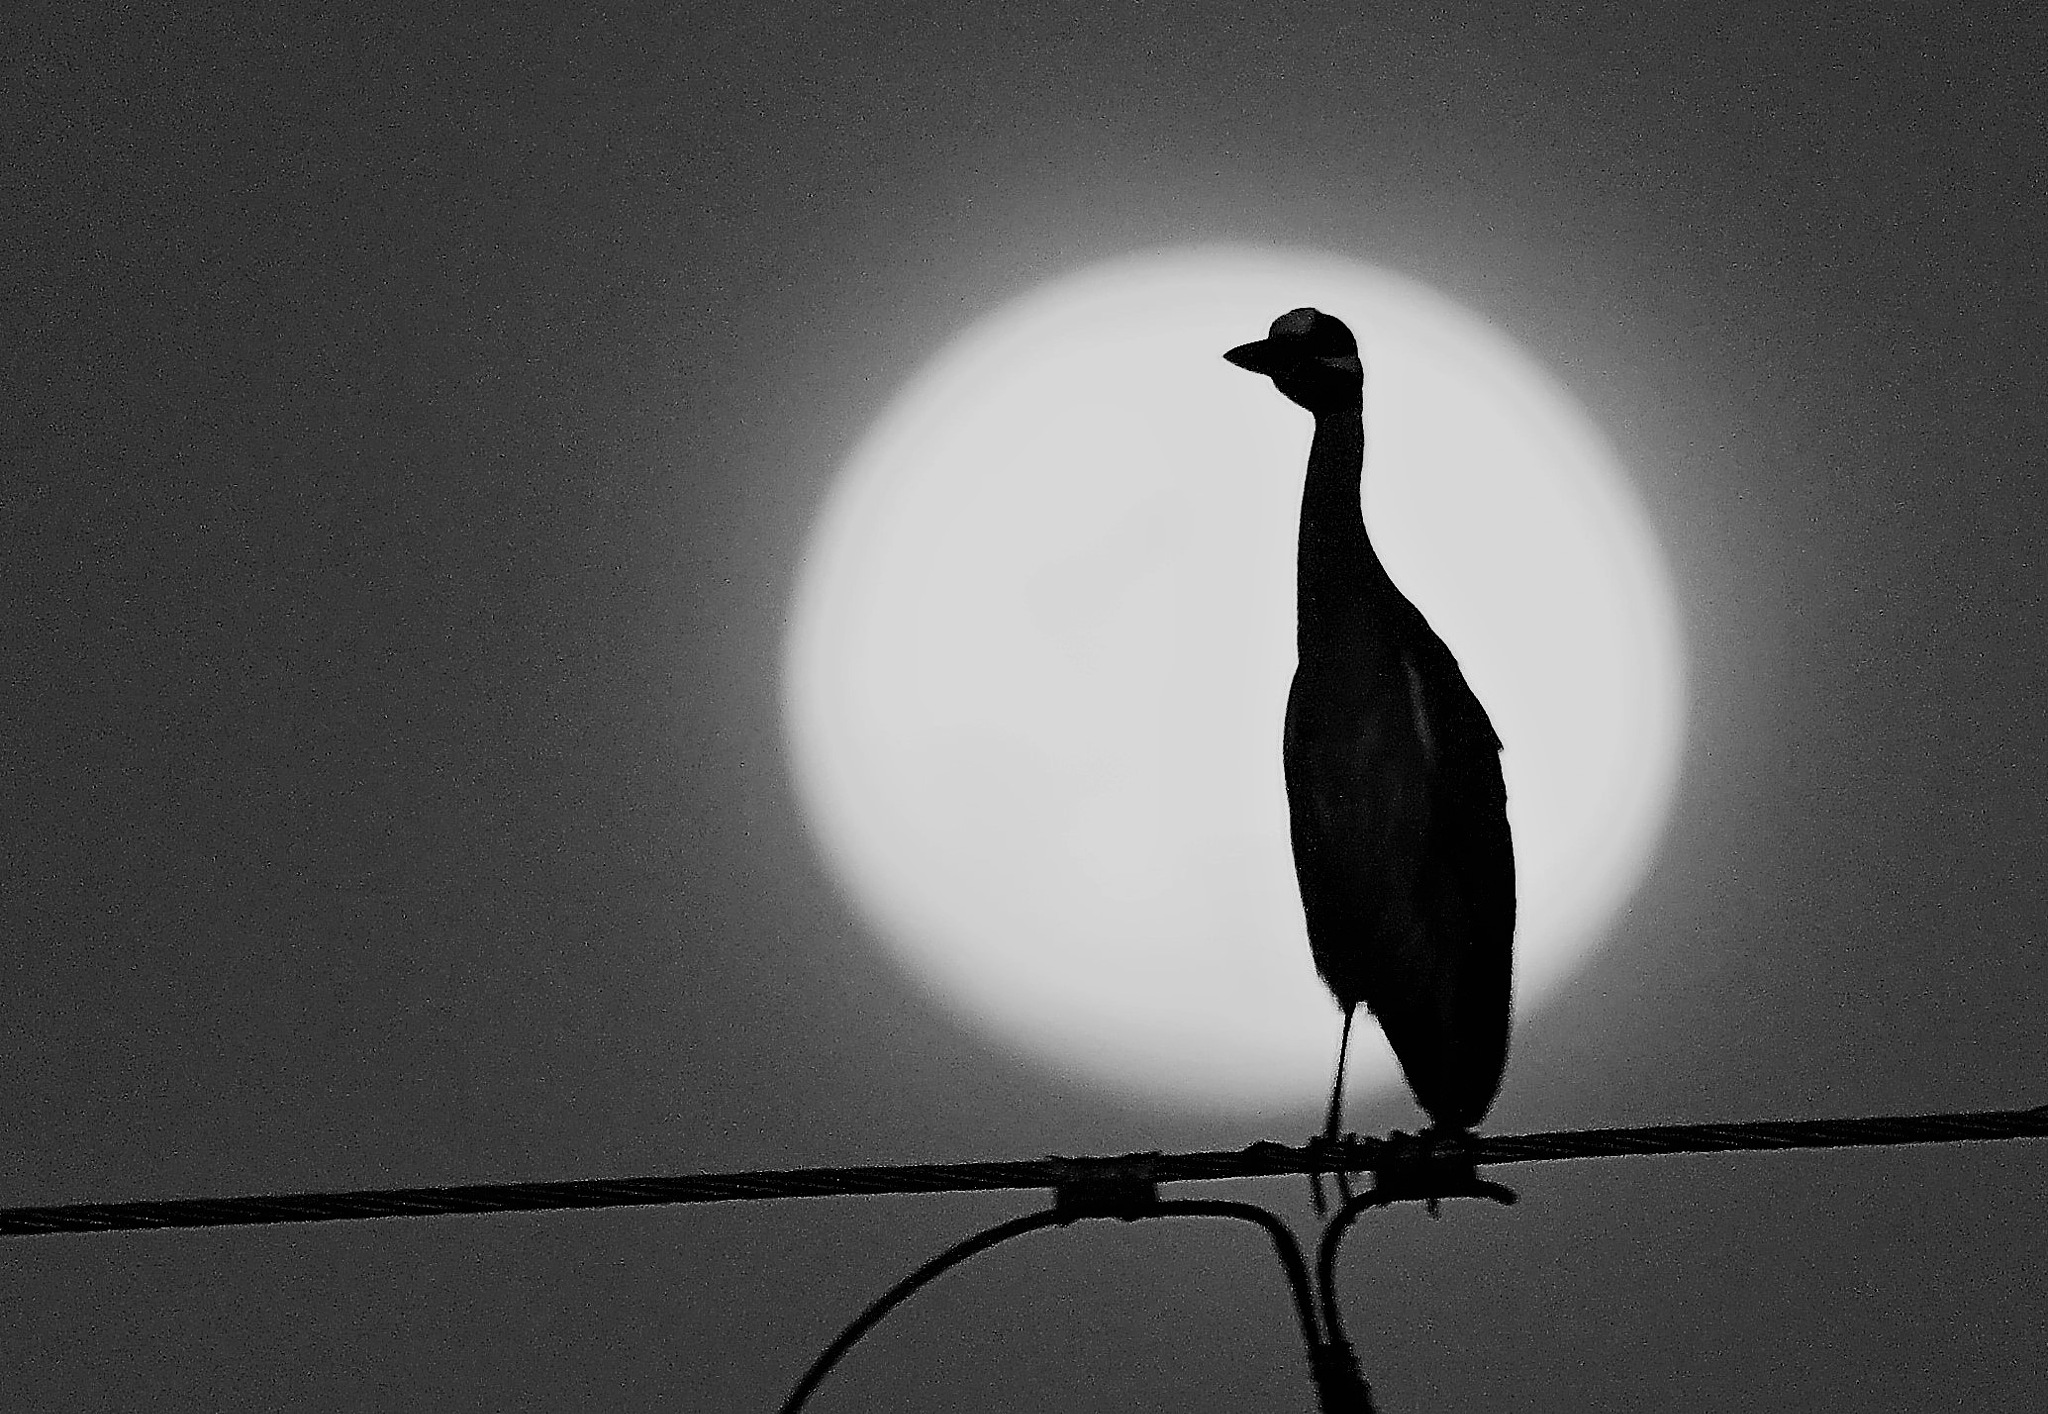 Yellow-crowned Night Heron III by MichaelDorsey